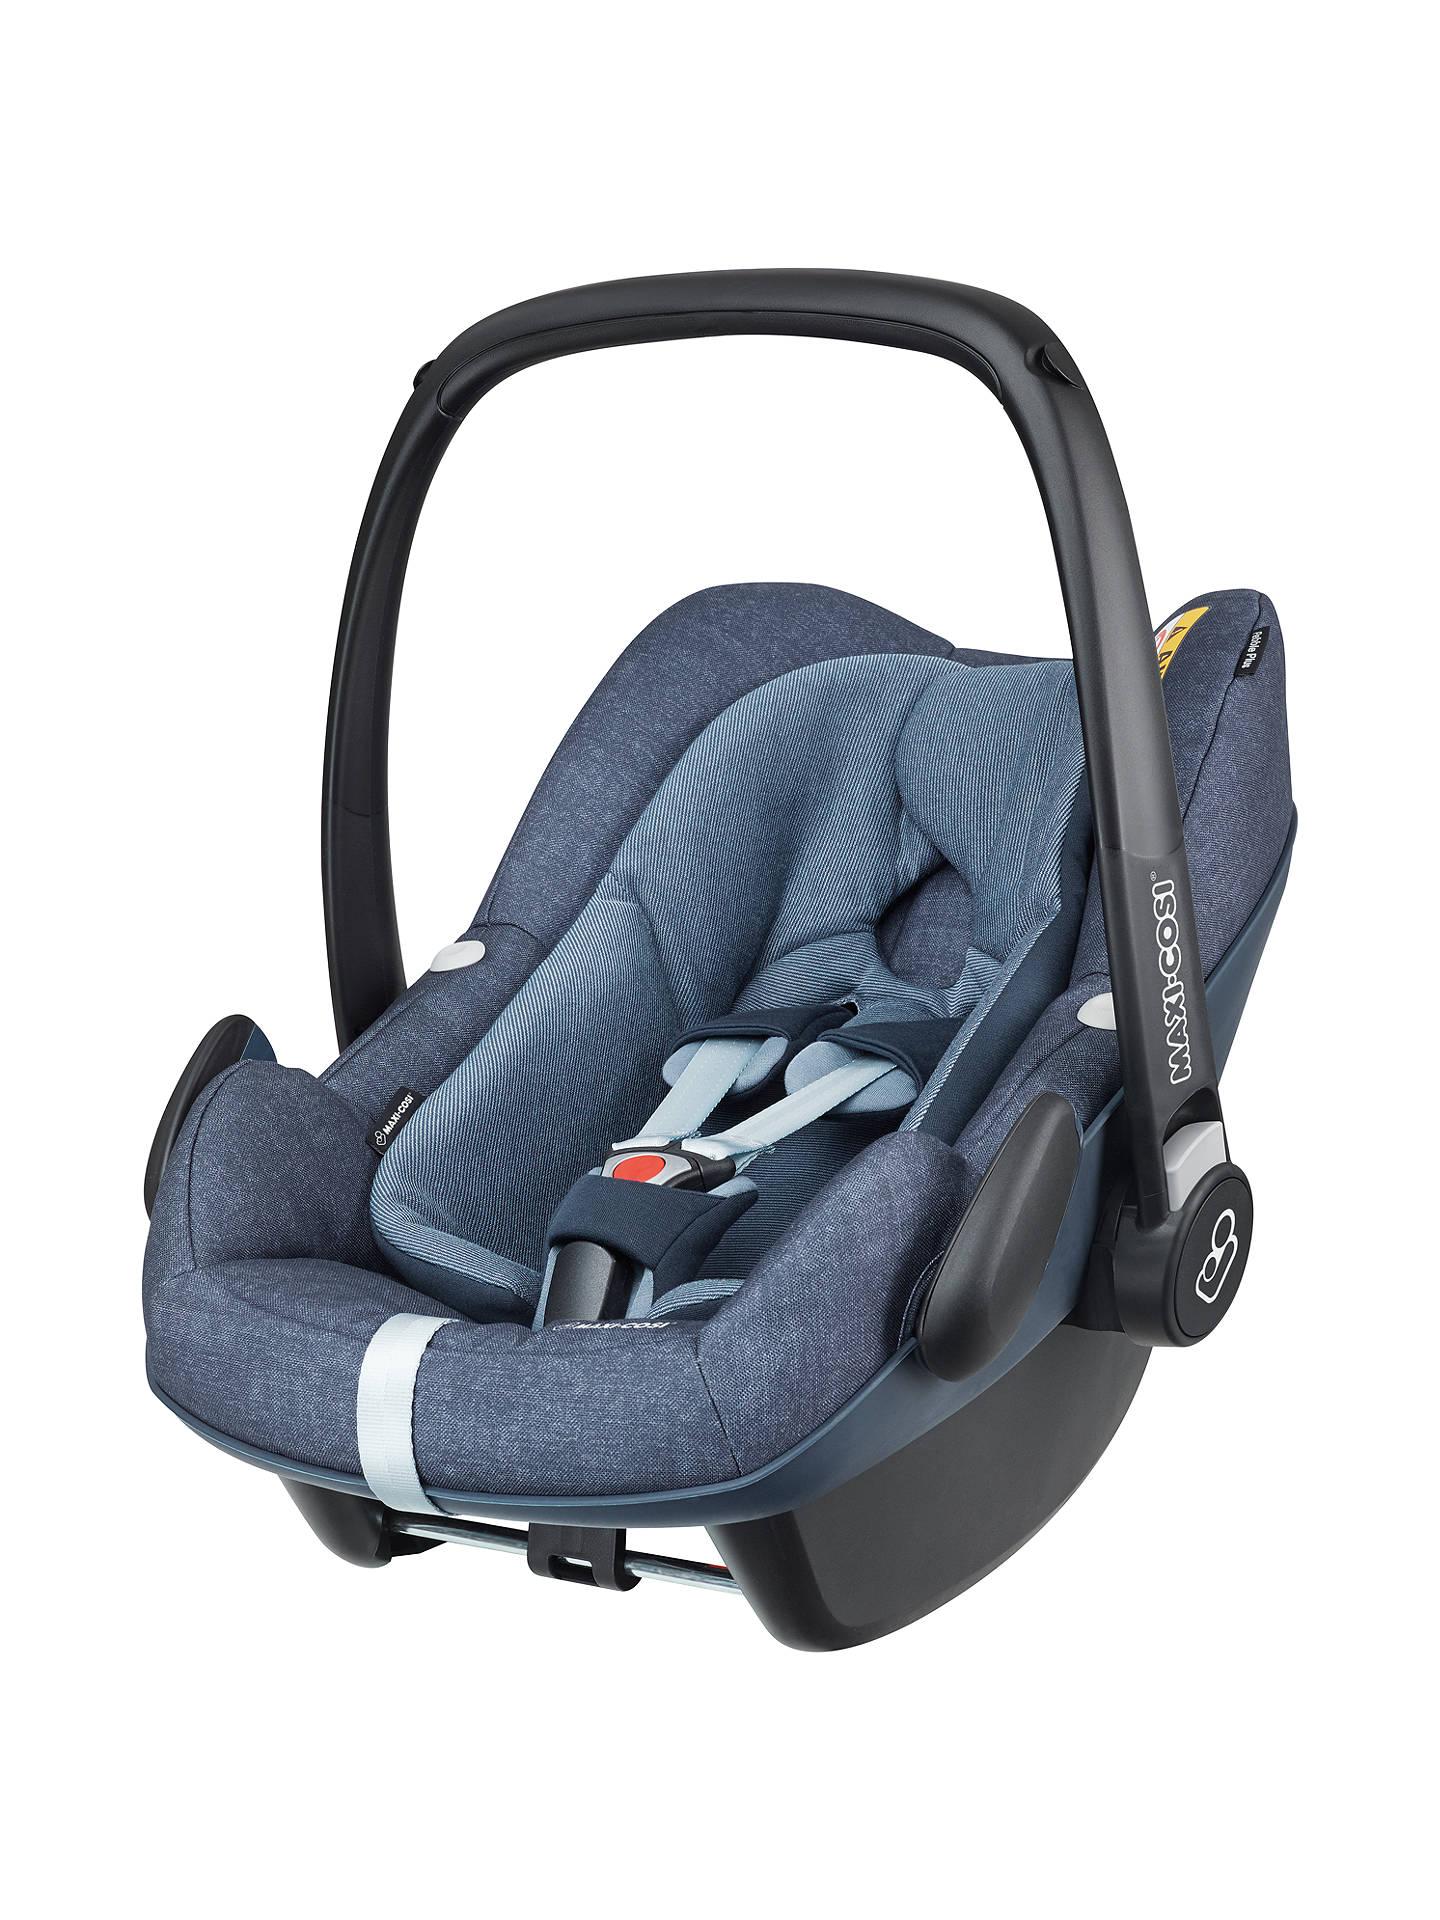 maxi cosi pebble plus i size group 0 baby car seat nomad. Black Bedroom Furniture Sets. Home Design Ideas